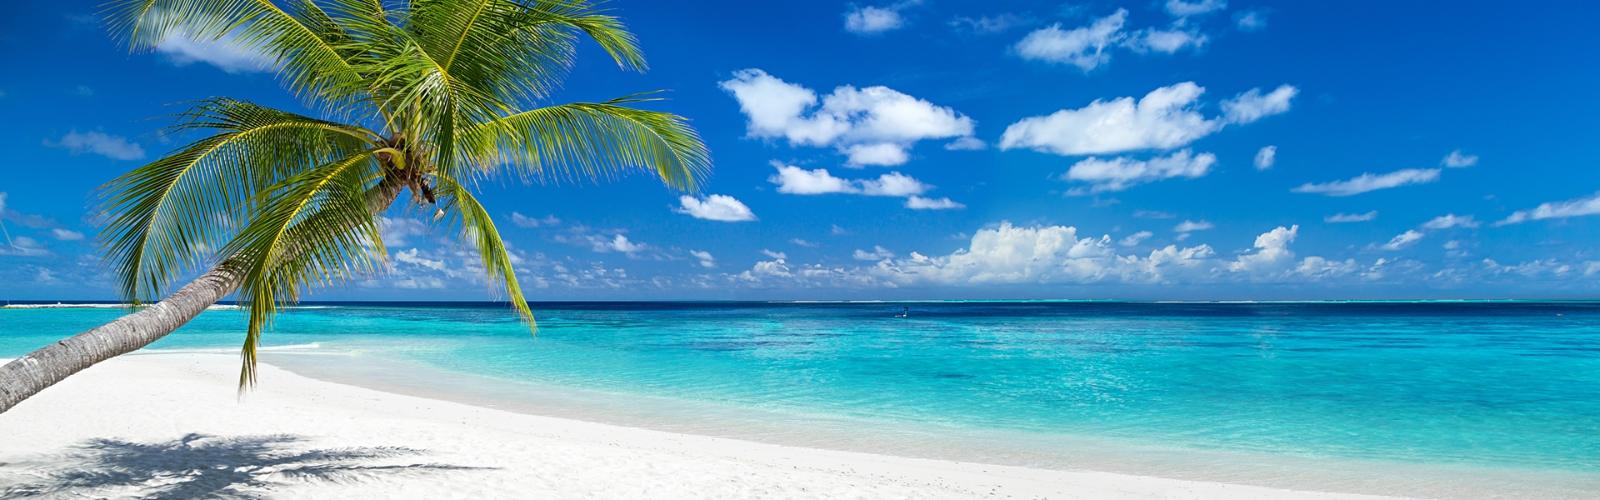 Beach Holidays 2020/2021 | Best Beach Holidays | Virgin ...